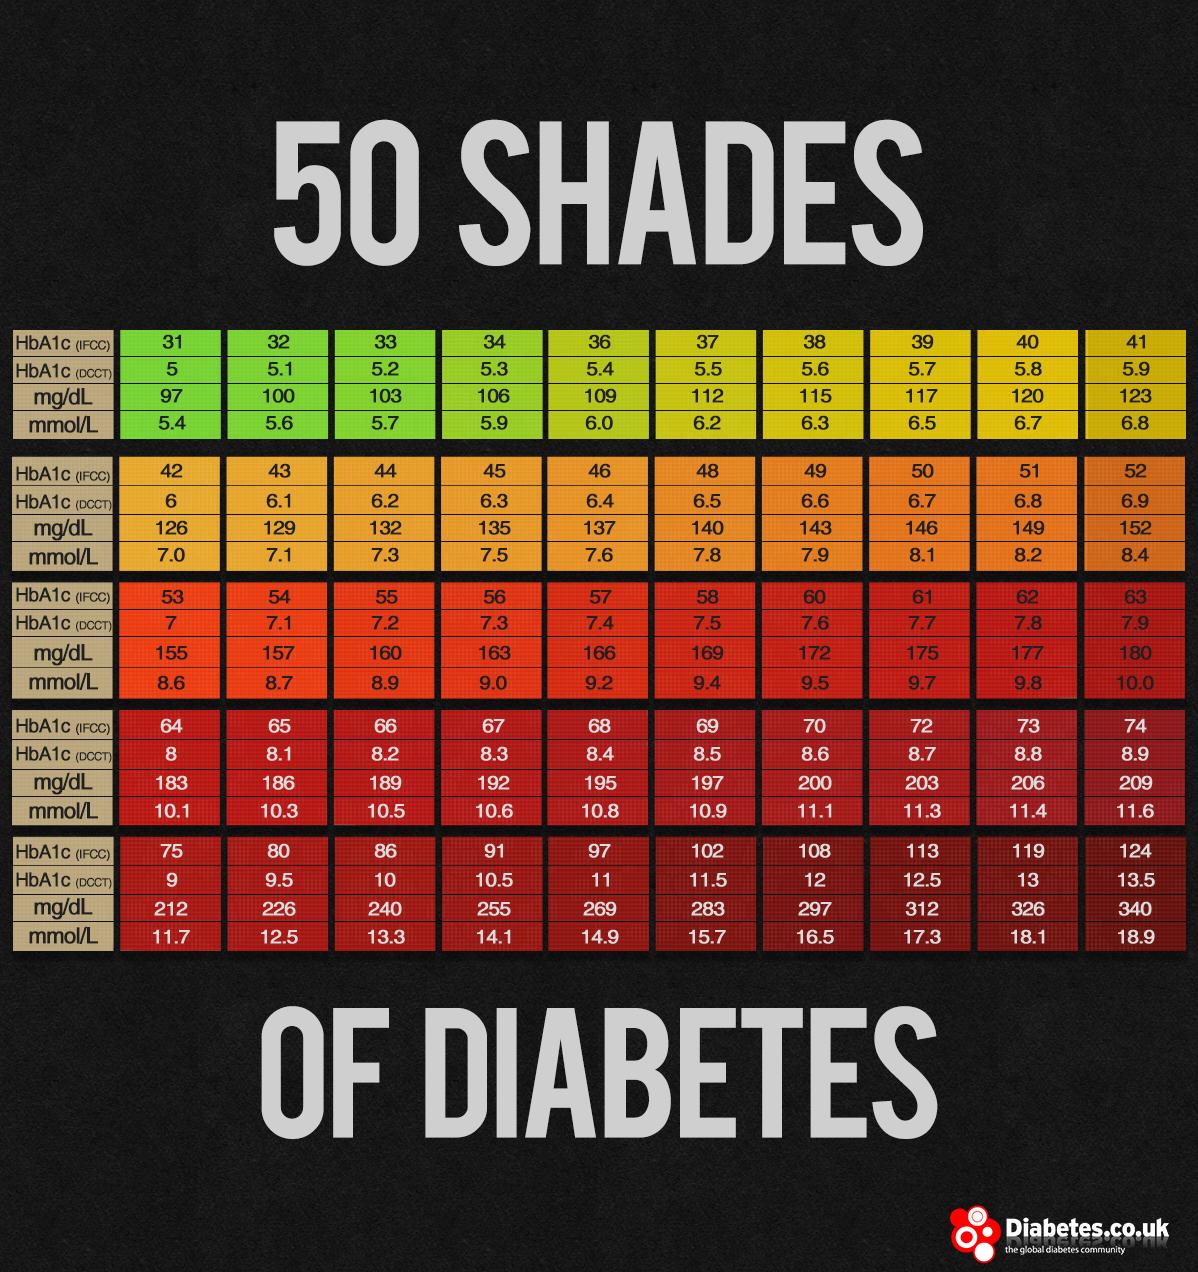 a1c average blood sugar chart